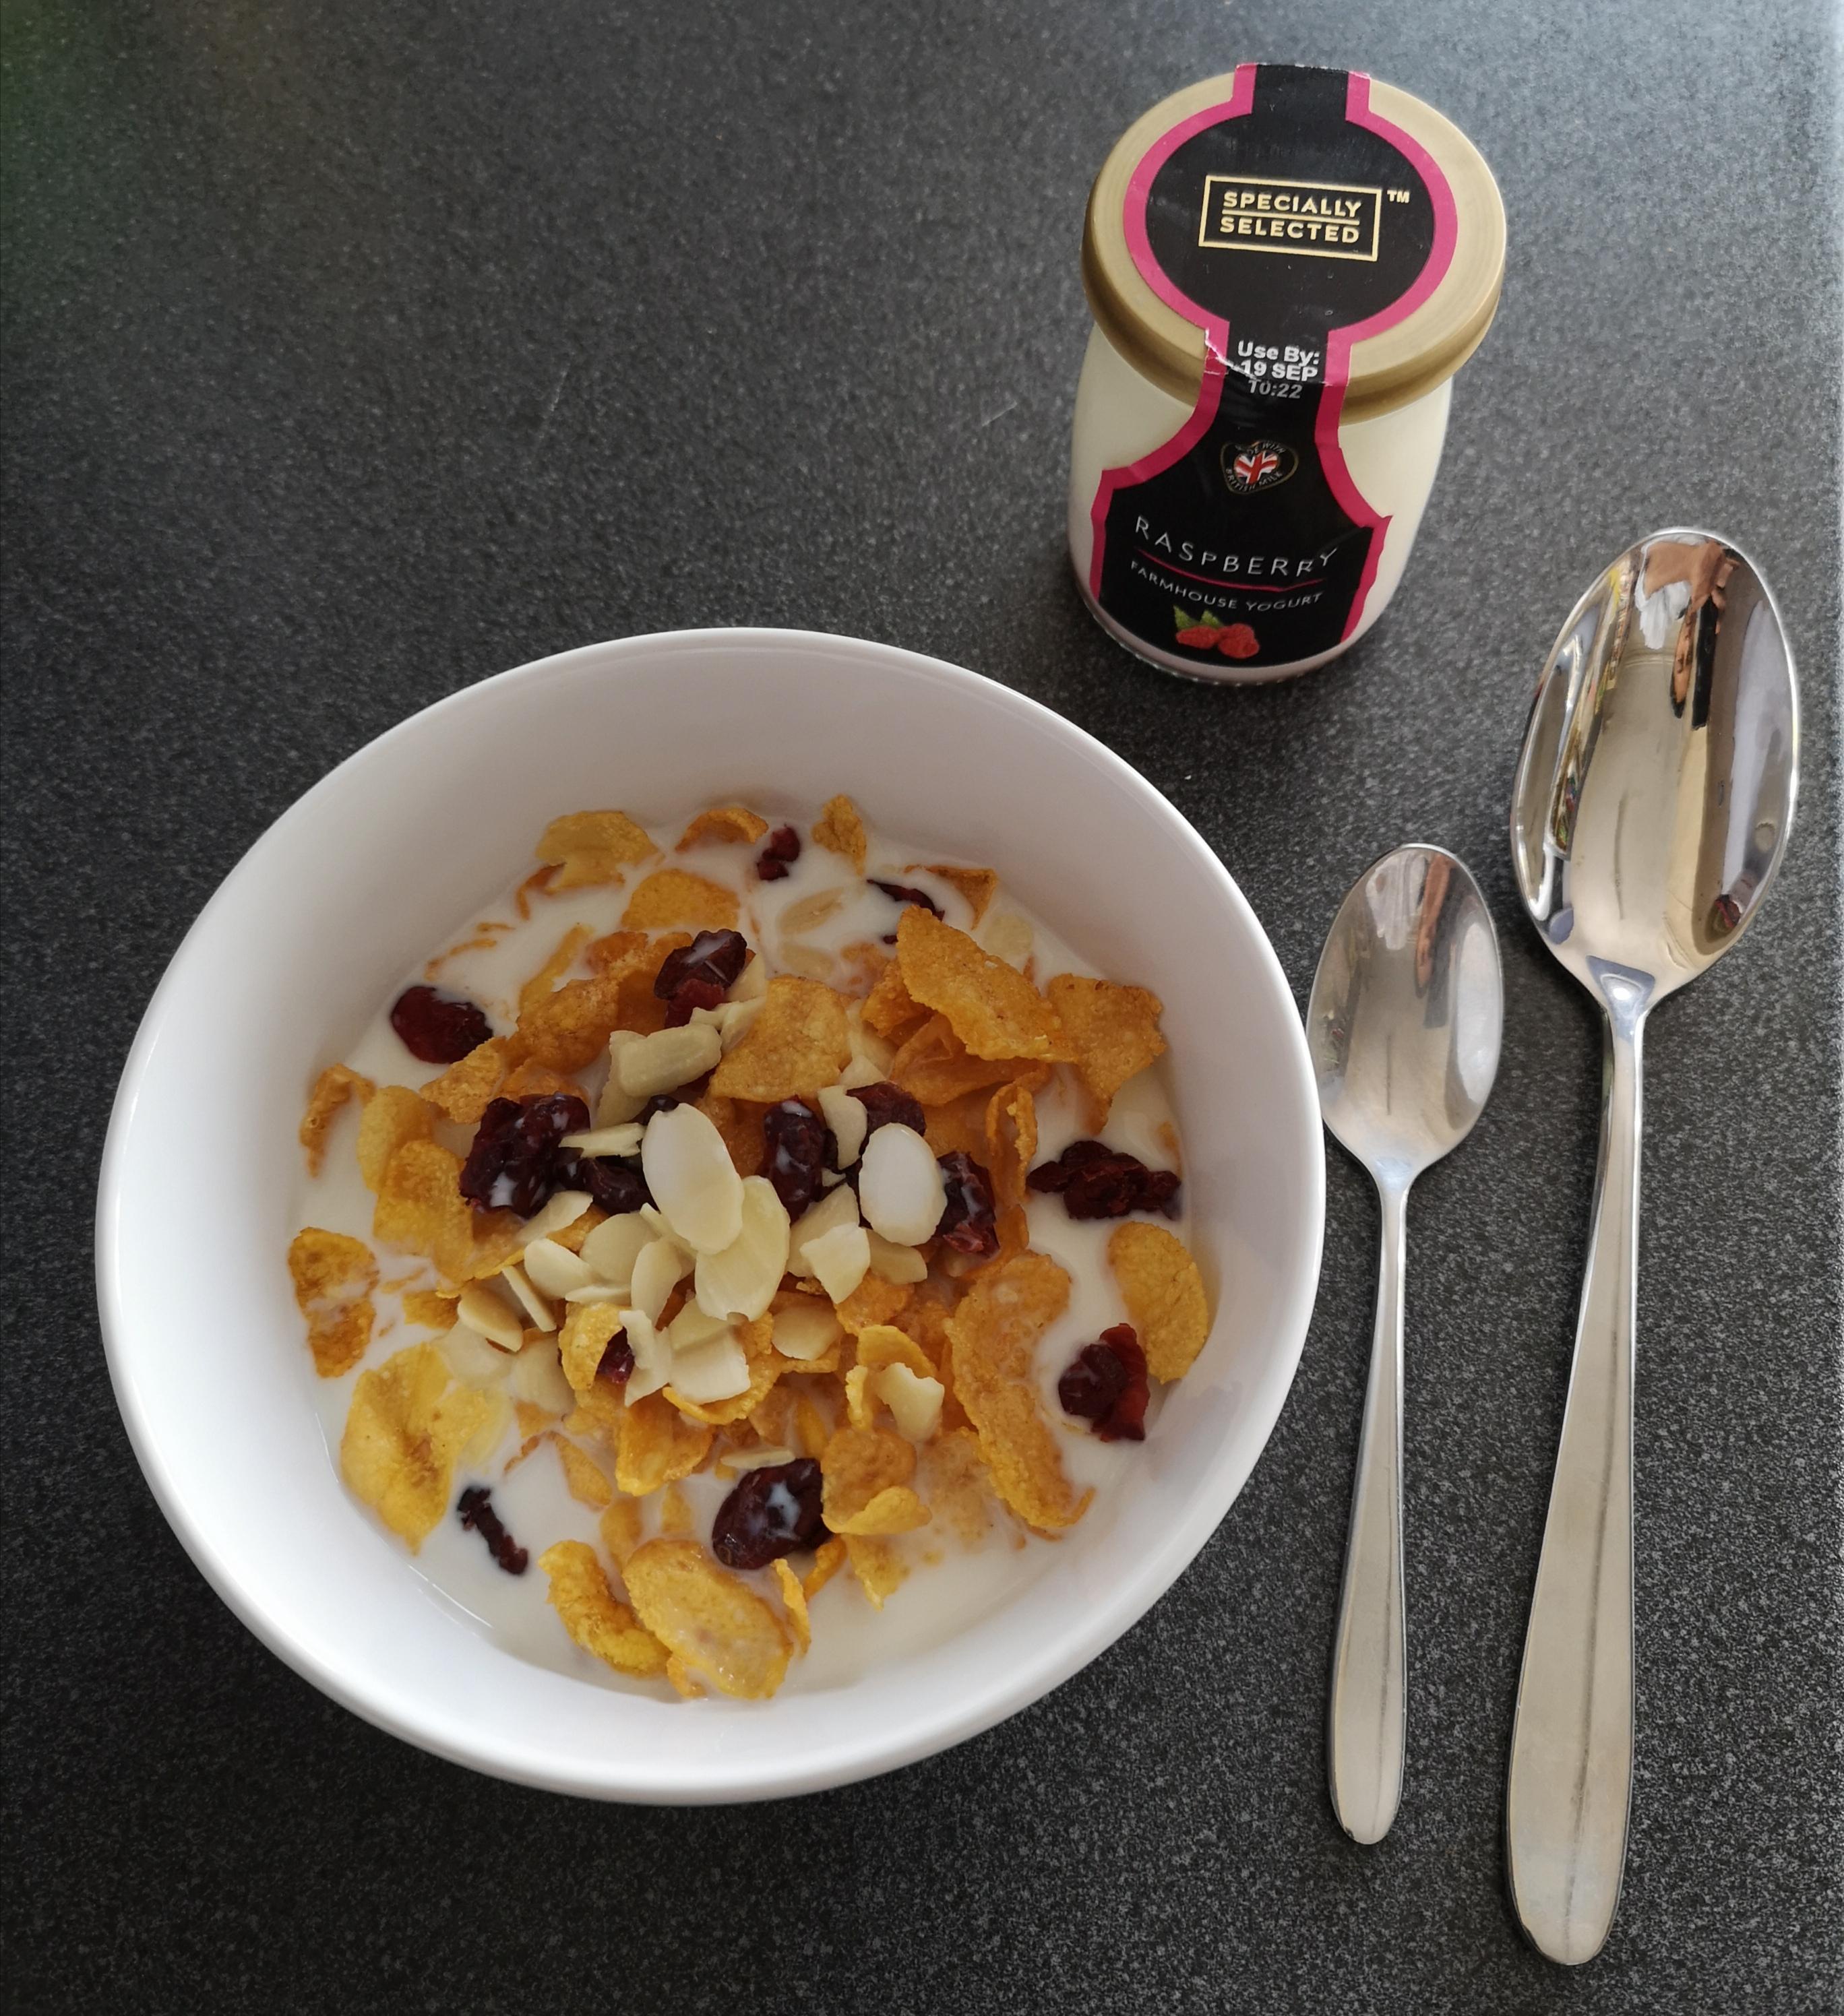 Light cereal option with yogurt